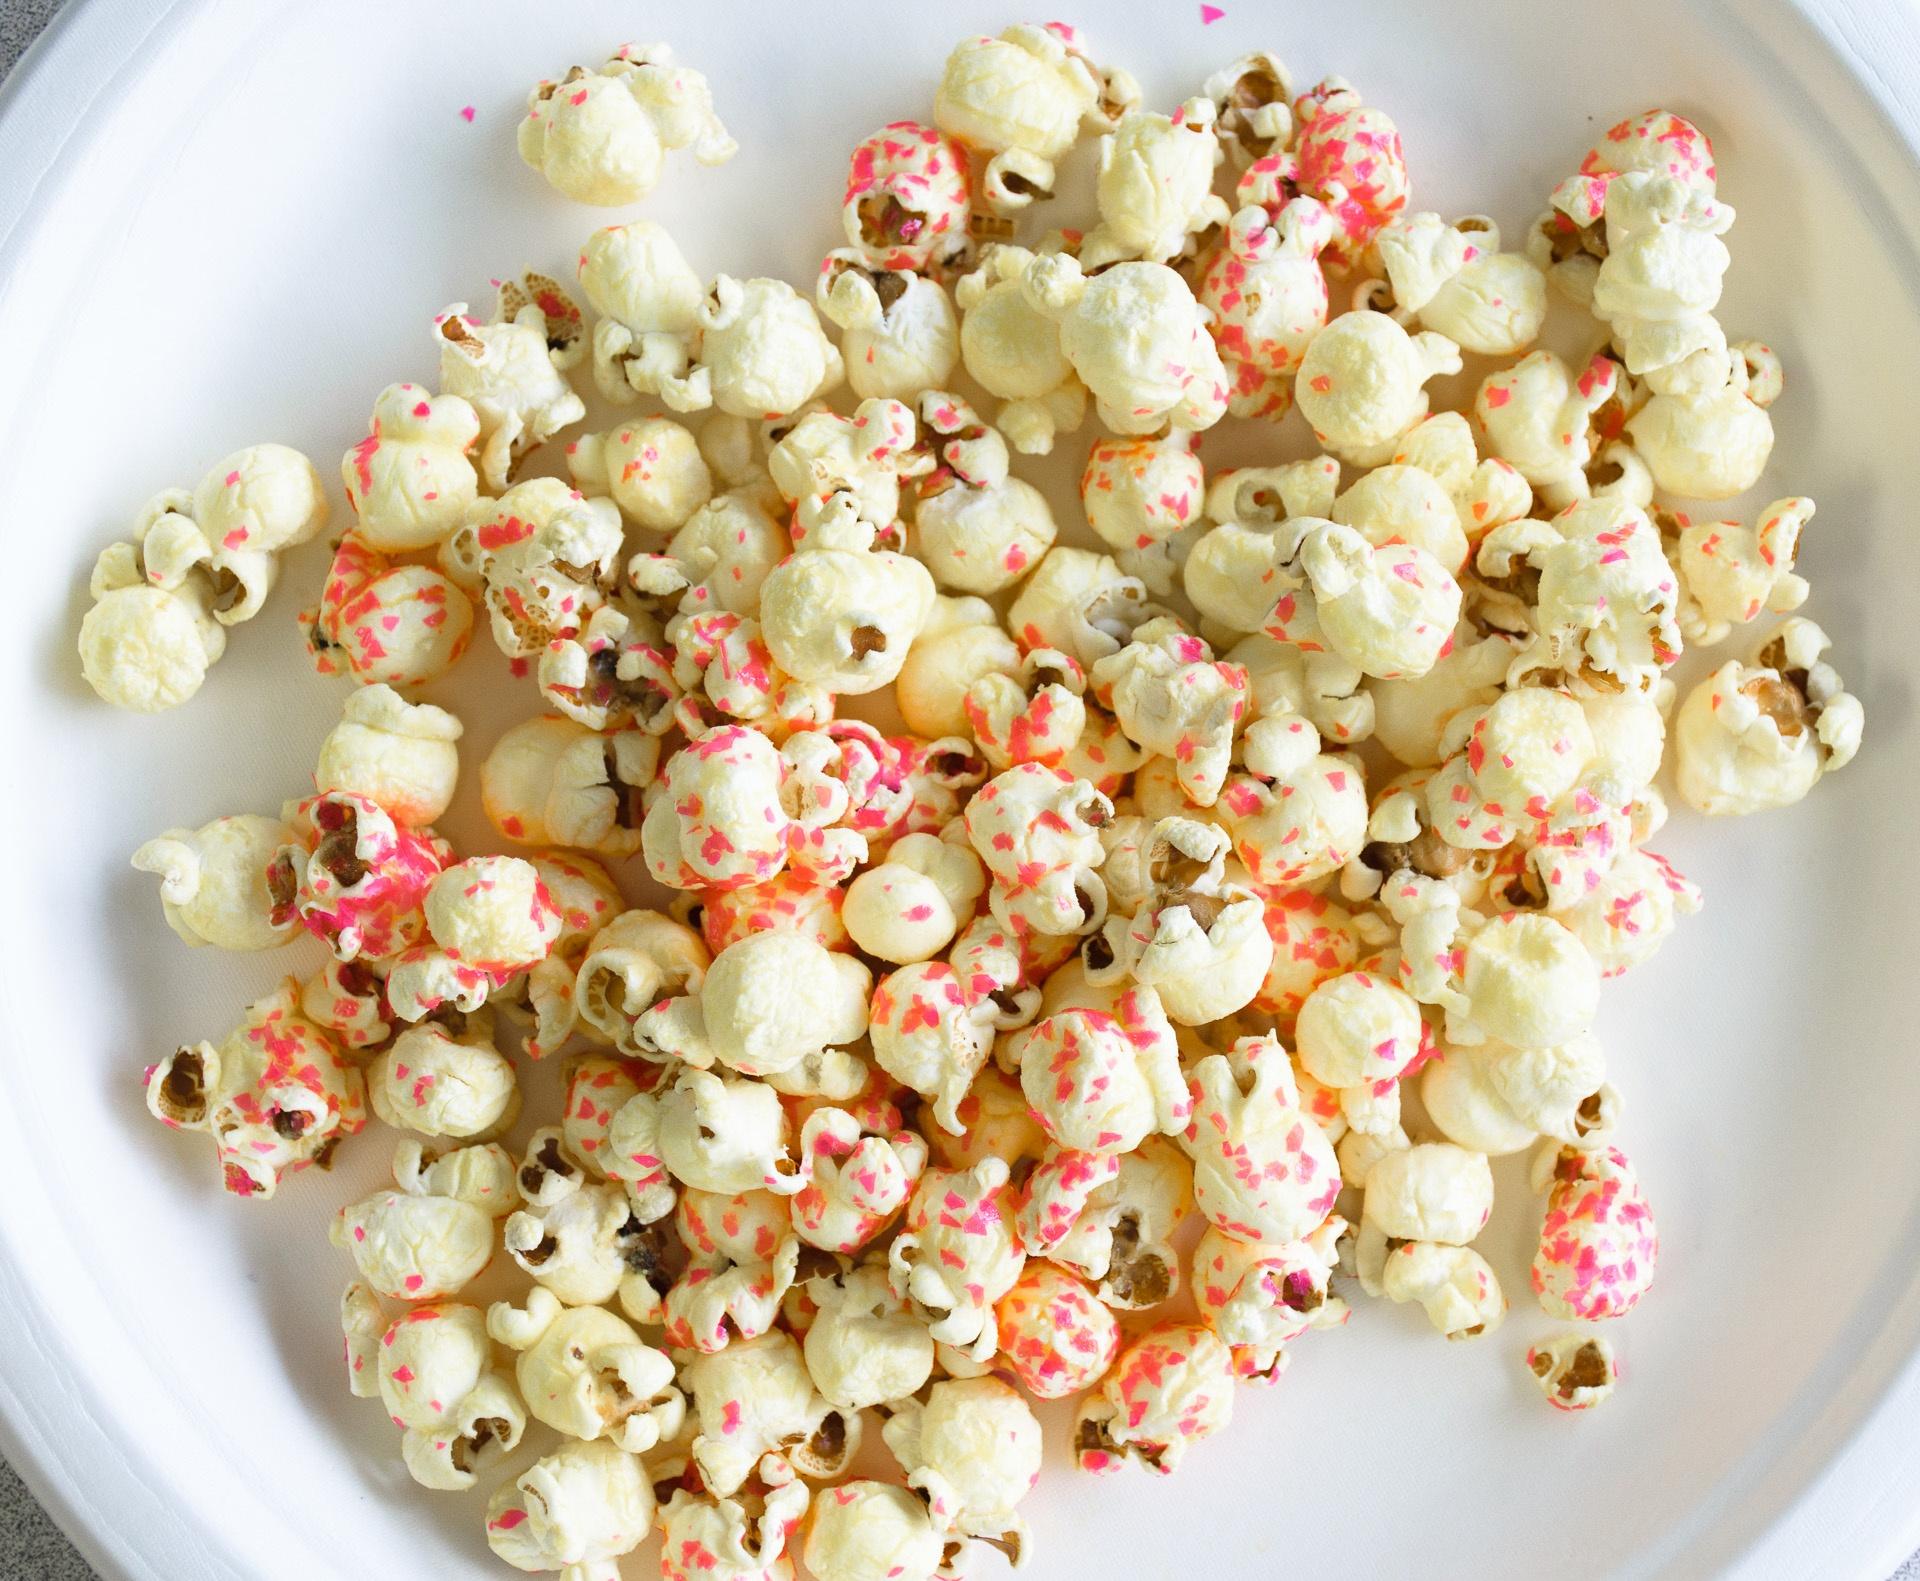 popcorn-w-pink-edible-glitter.jpg